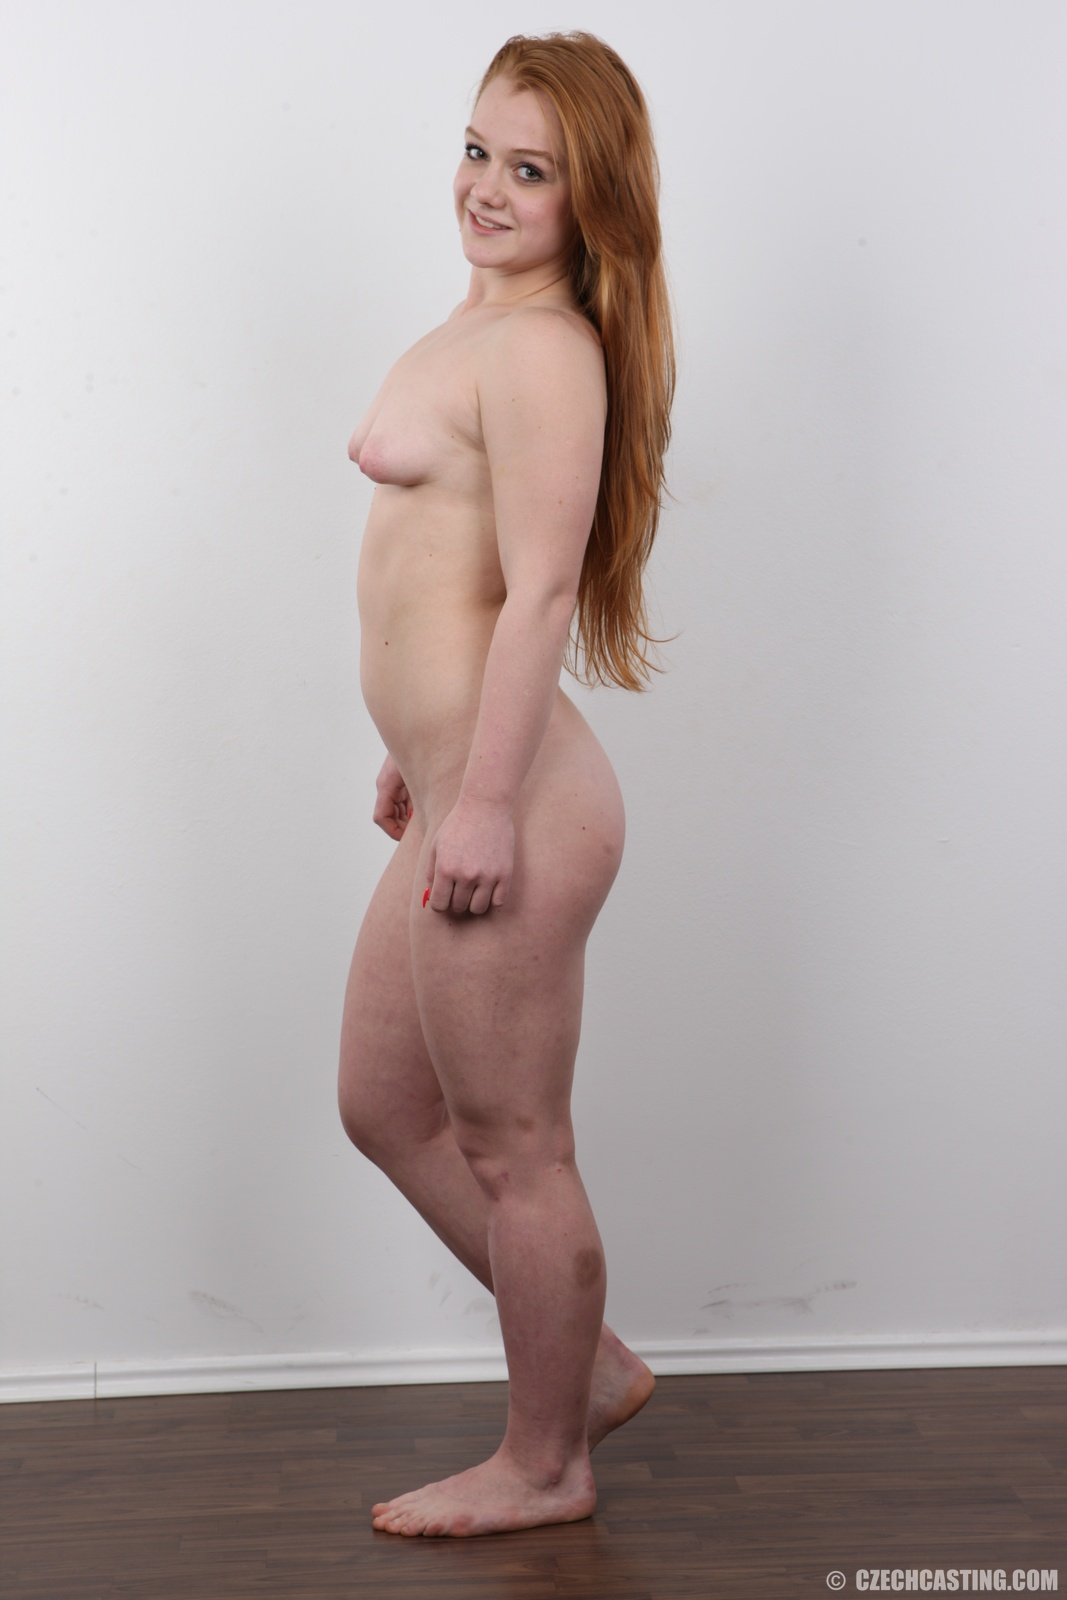 wpid-18-year-old-eliska-casting-photos30.jpg